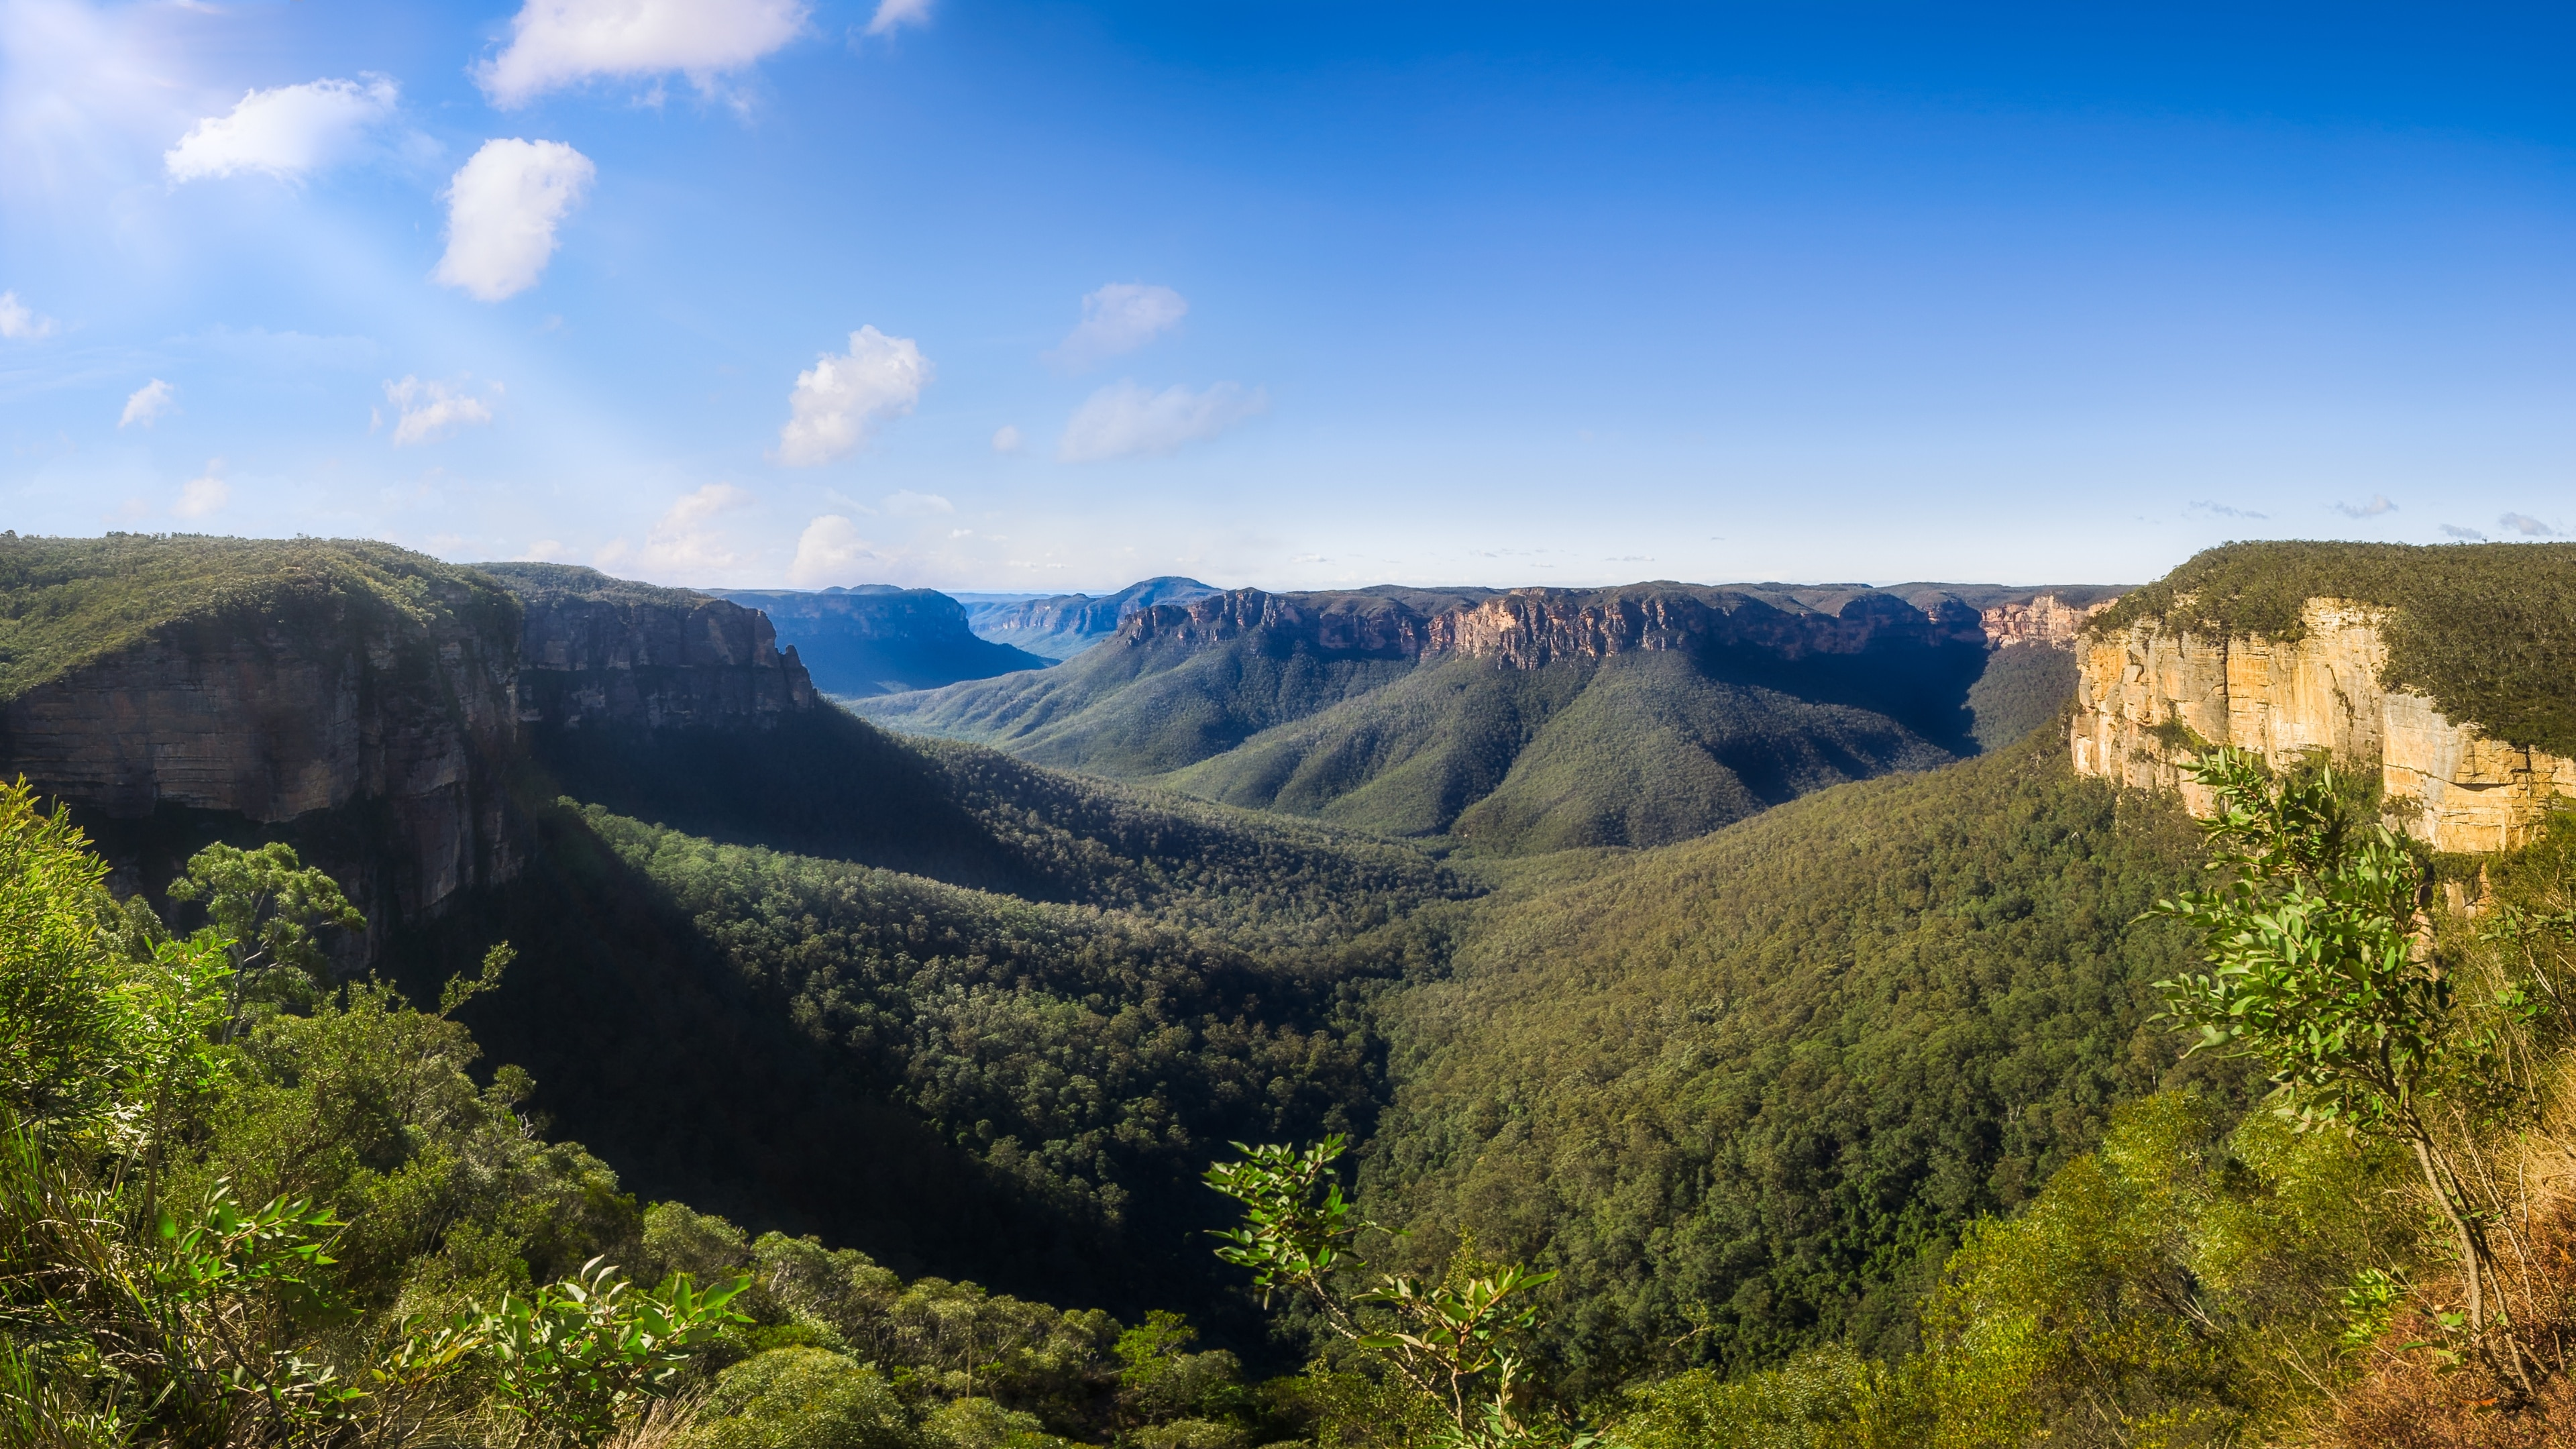 Blackheath, New South Wales, Australia